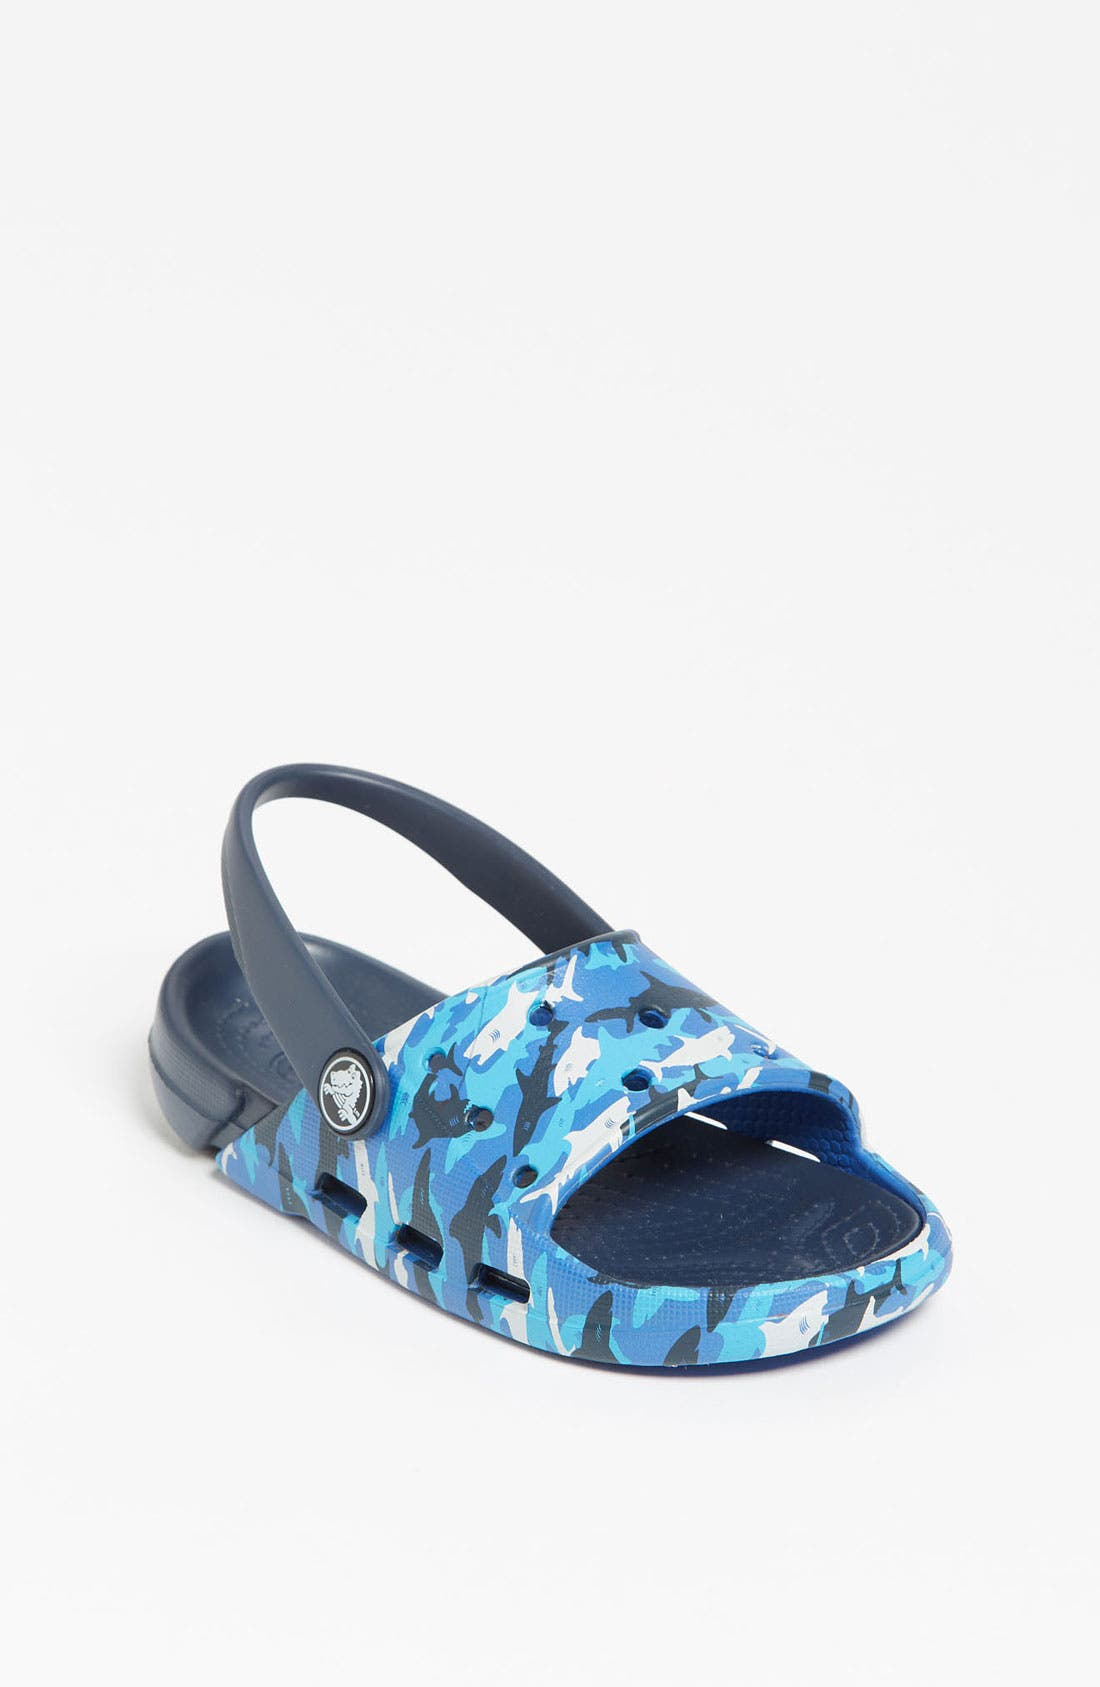 Main Image - CROCS™ 'Electro' Sandal (Walker, Toddler & Little Kid)